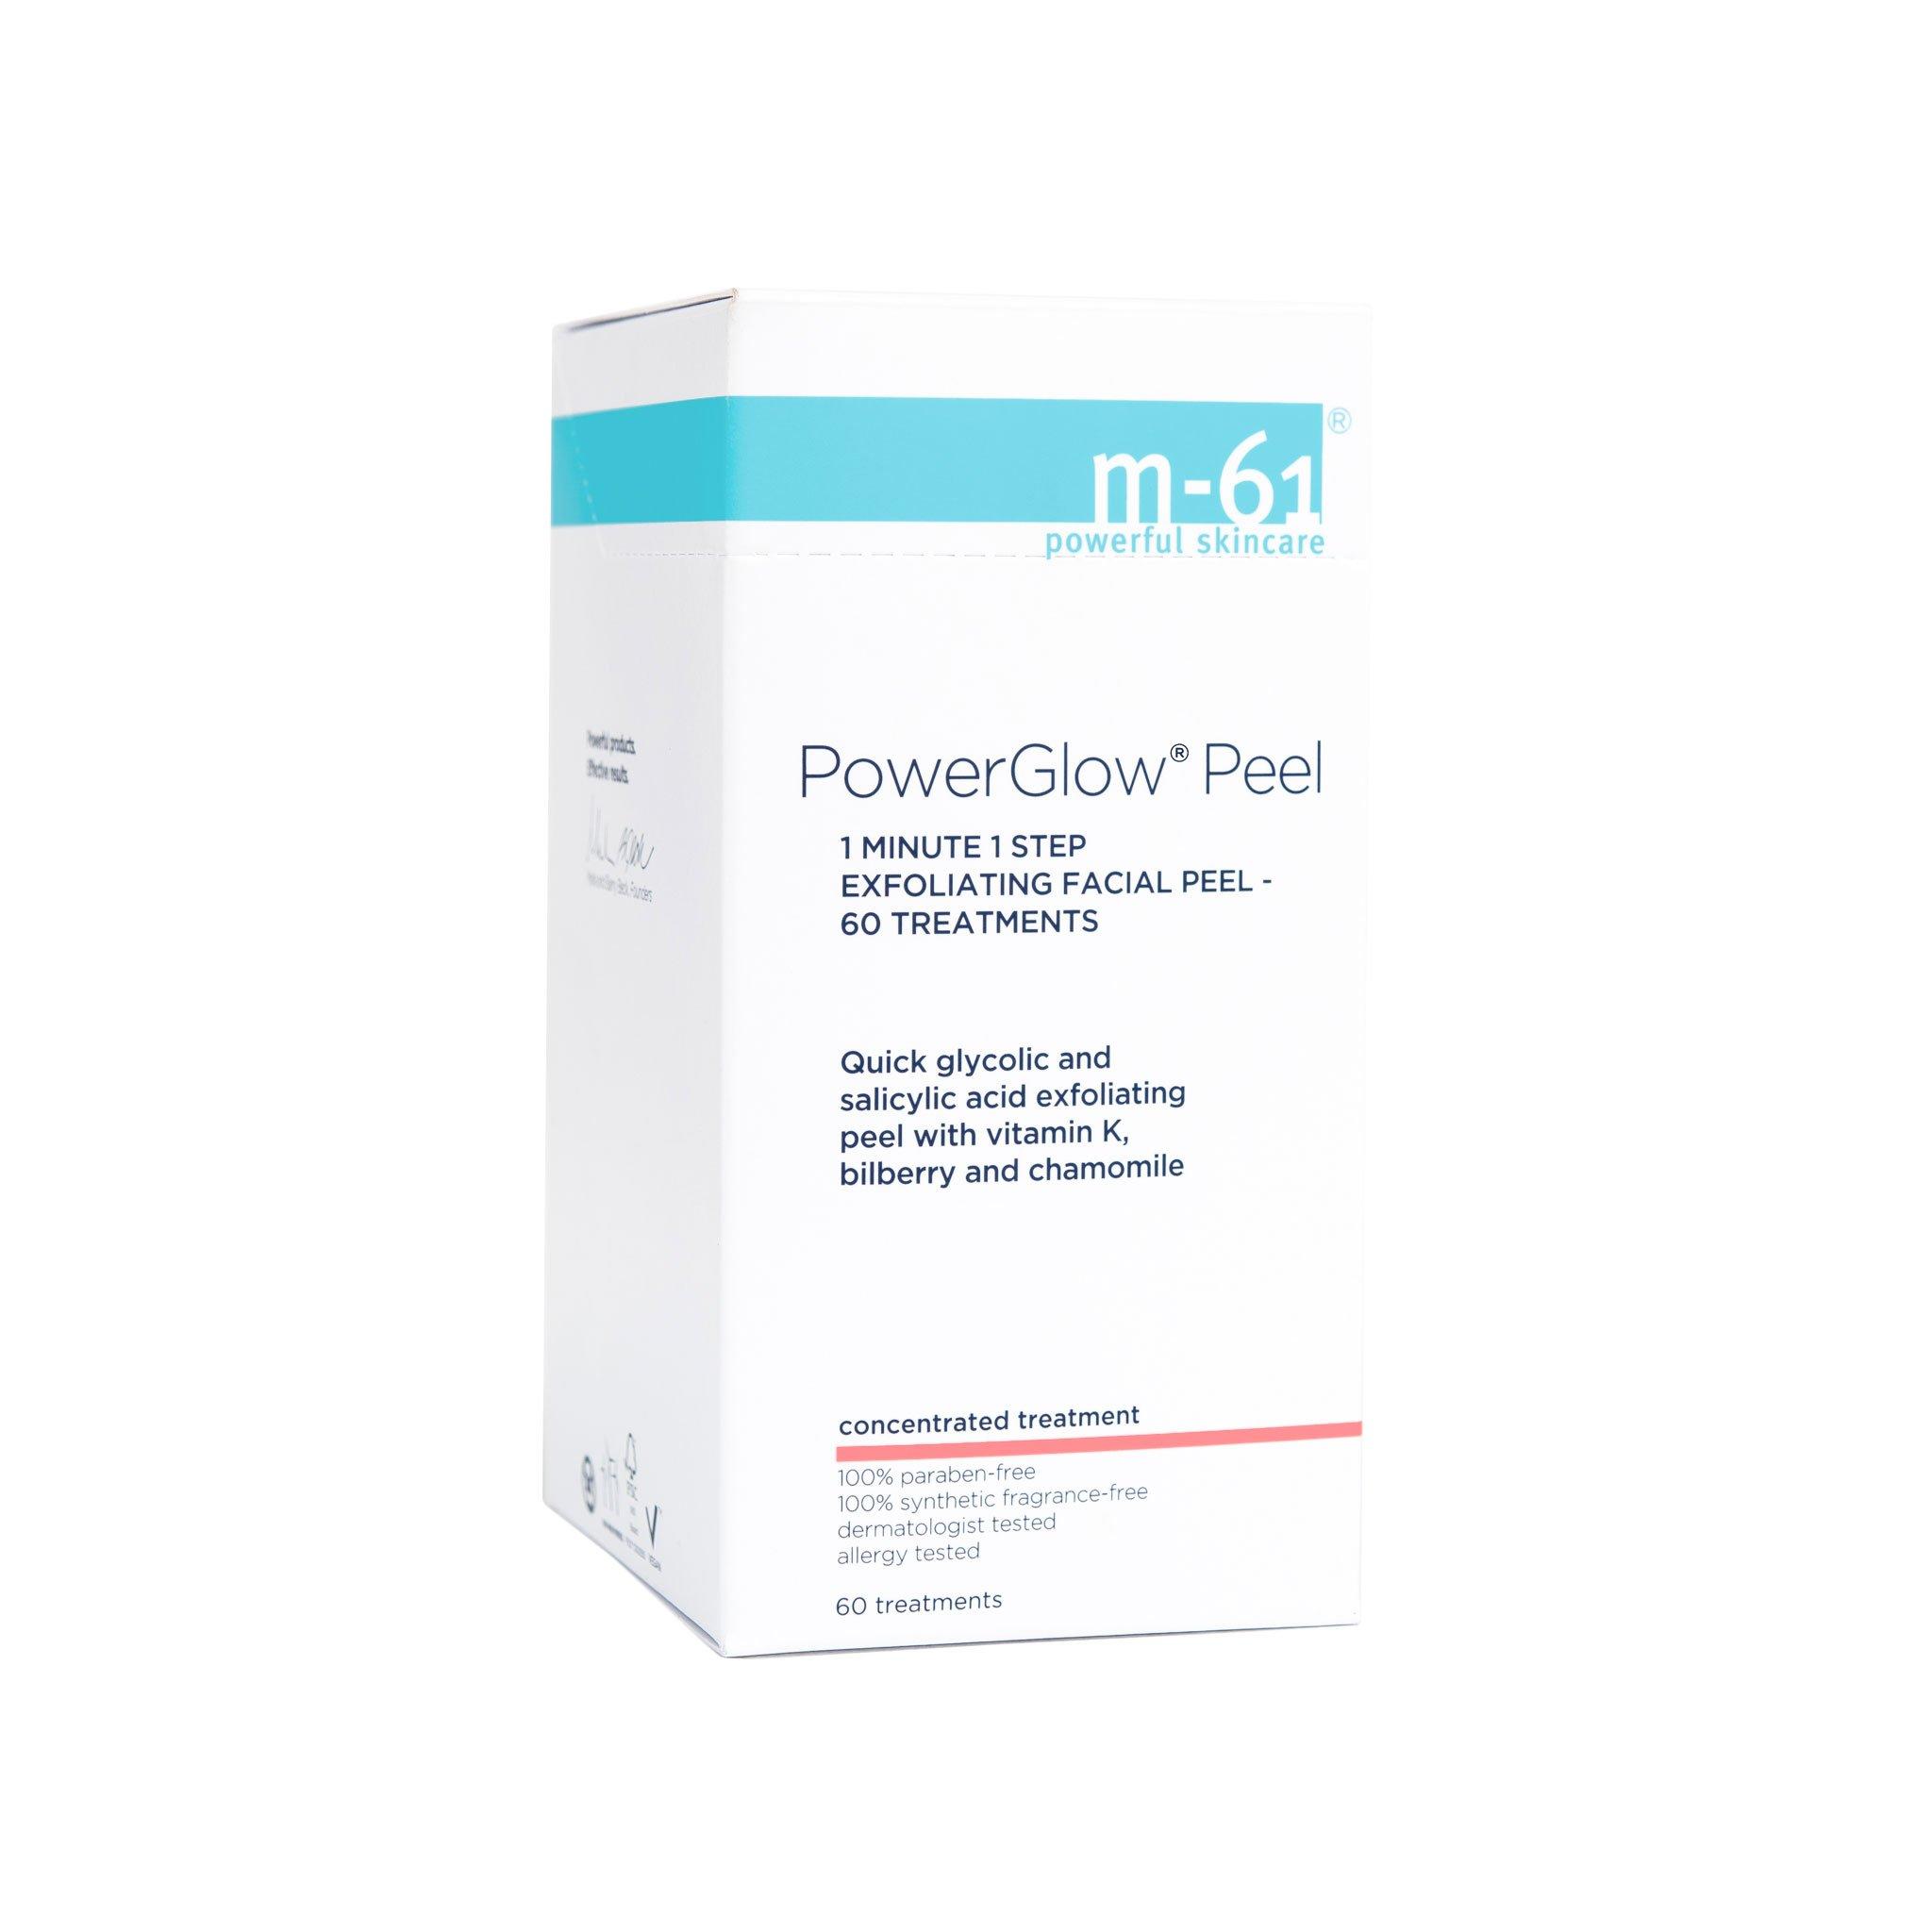 M-61 PowerGlow Peel, Size 60 Treatments